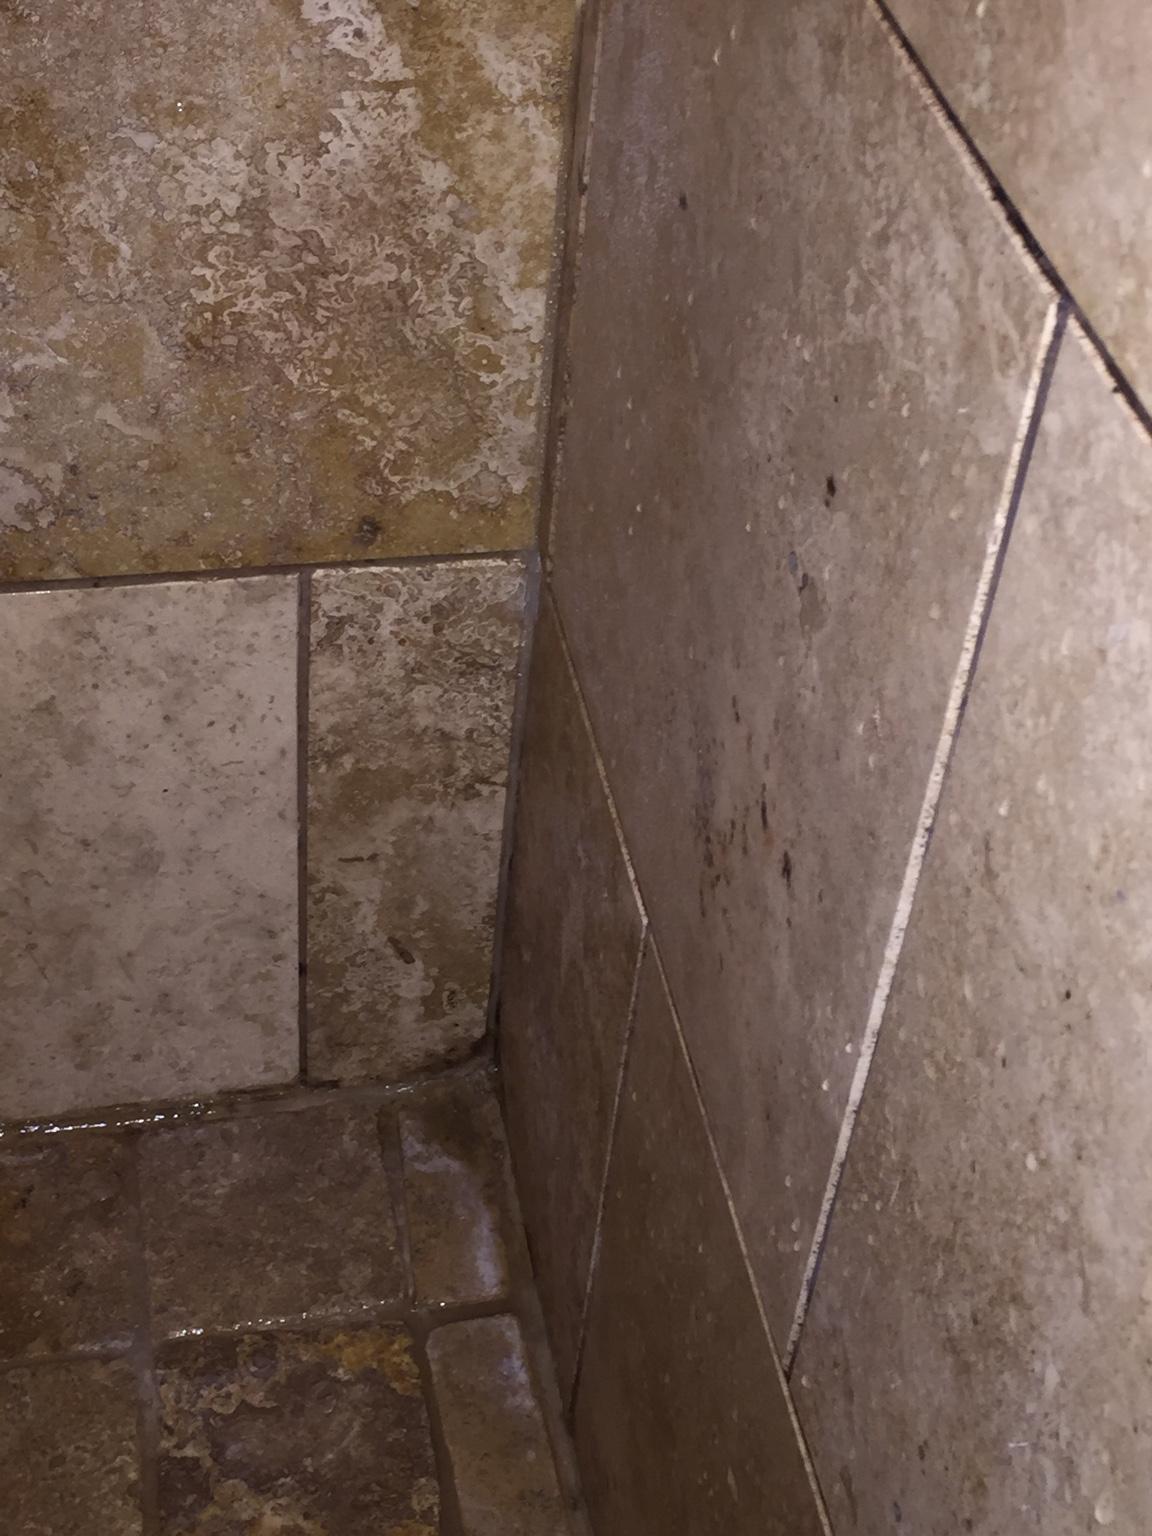 Of posts ceramic tile advice forums john bridge ceramic tile - 7c3064355d832a6f43d789f2a22be9b9 Jpg